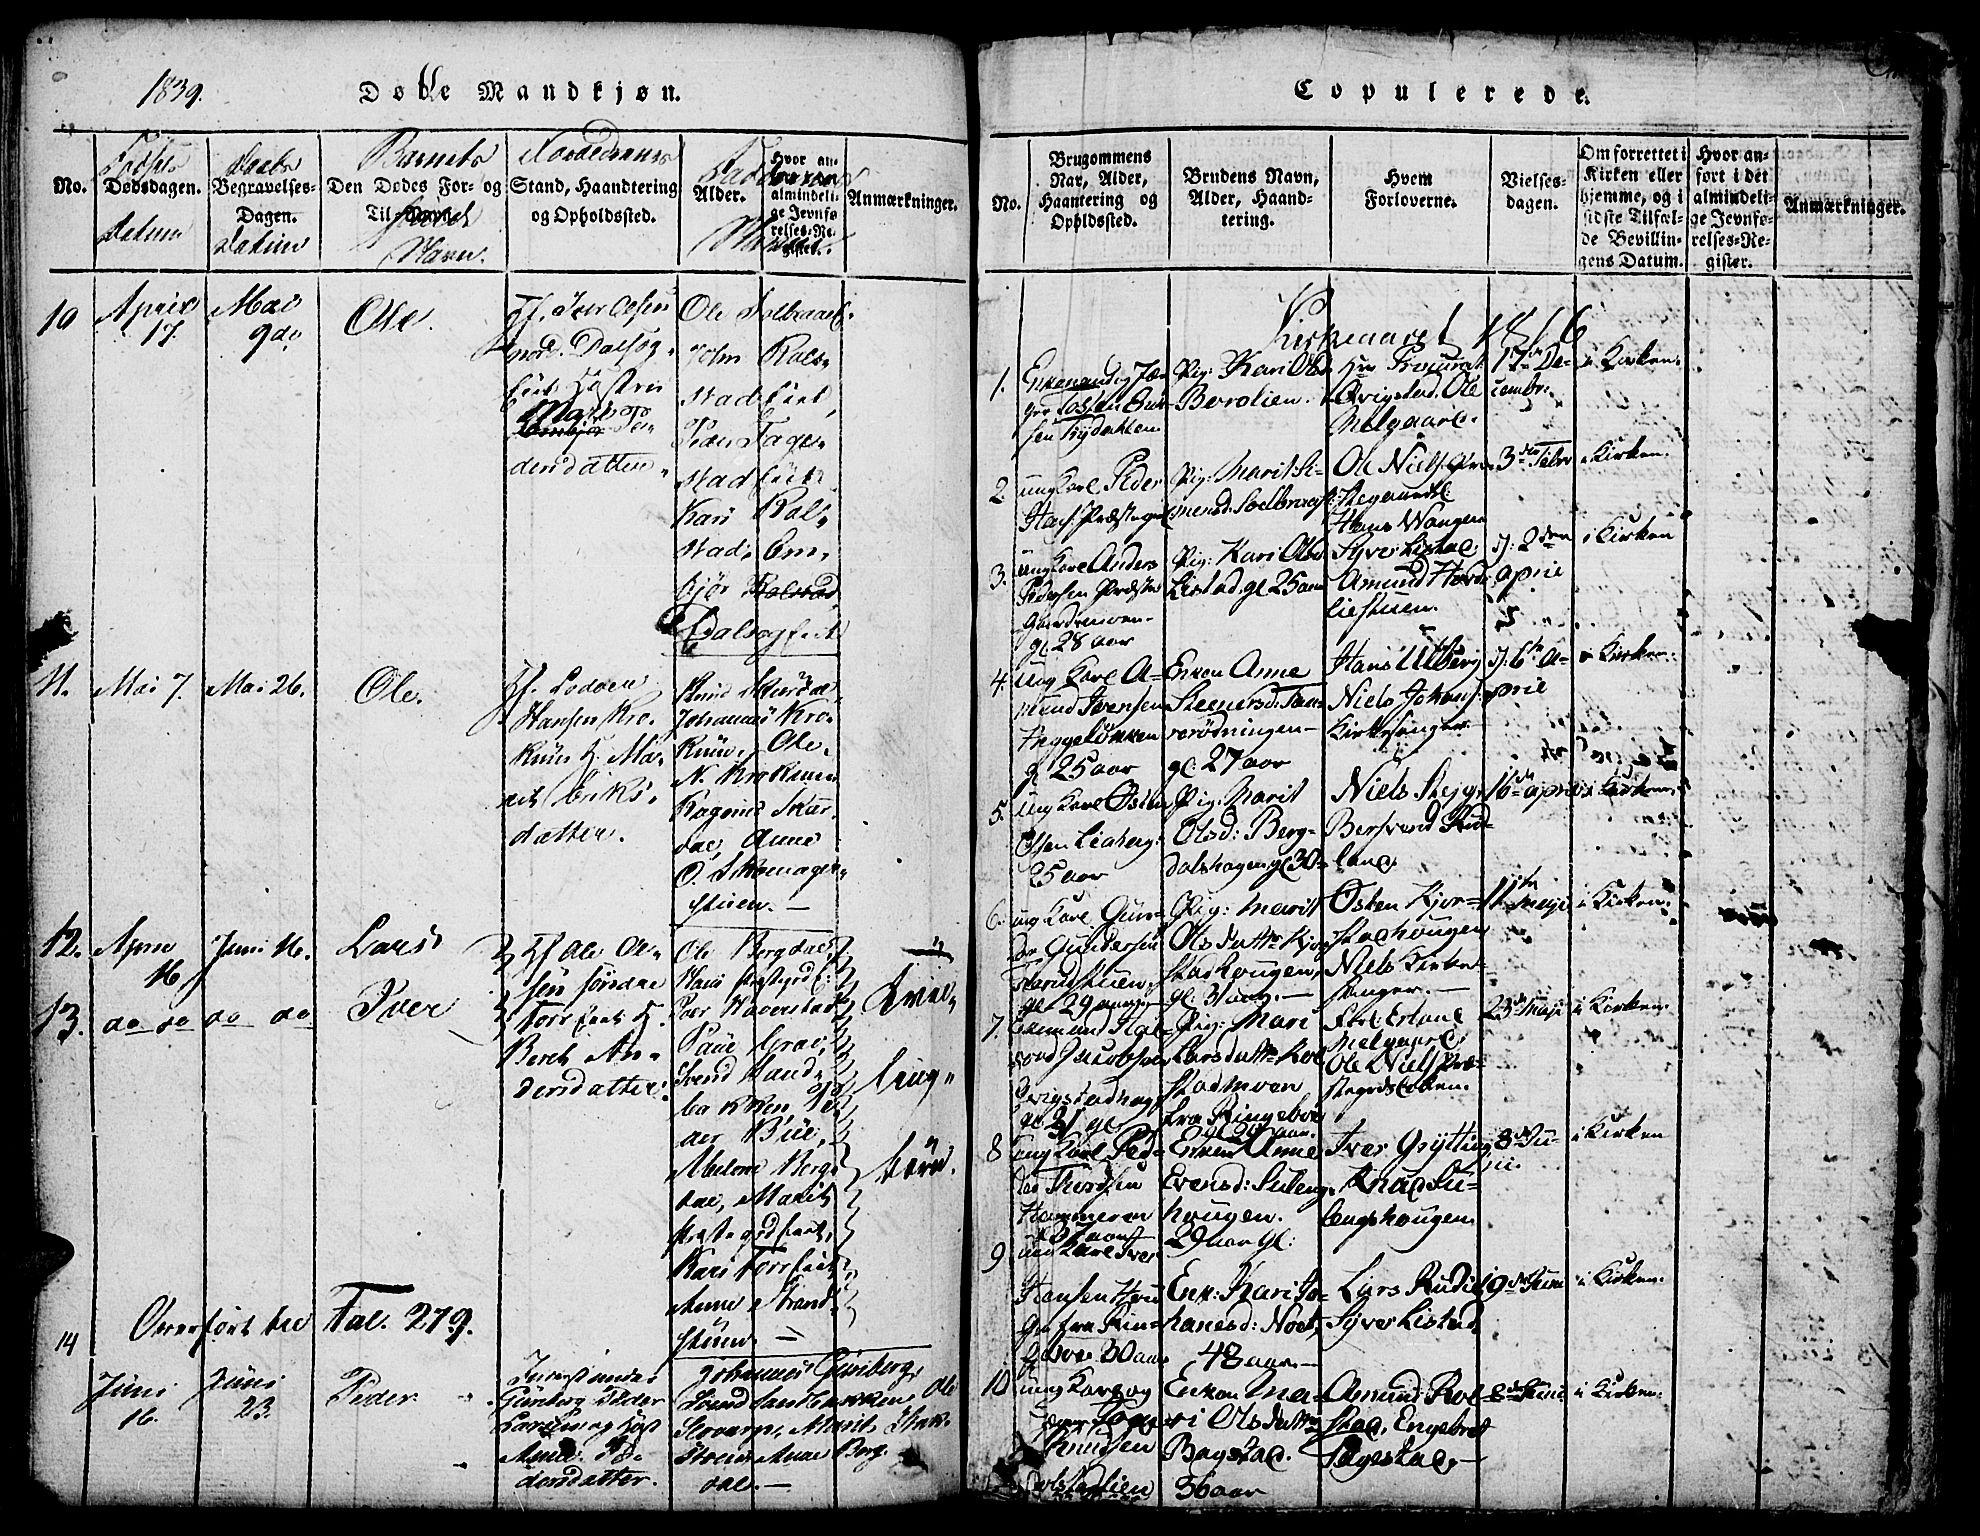 SAH, Fron prestekontor, H/Ha/Hab/L0001: Klokkerbok nr. 1, 1816-1843, s. 190